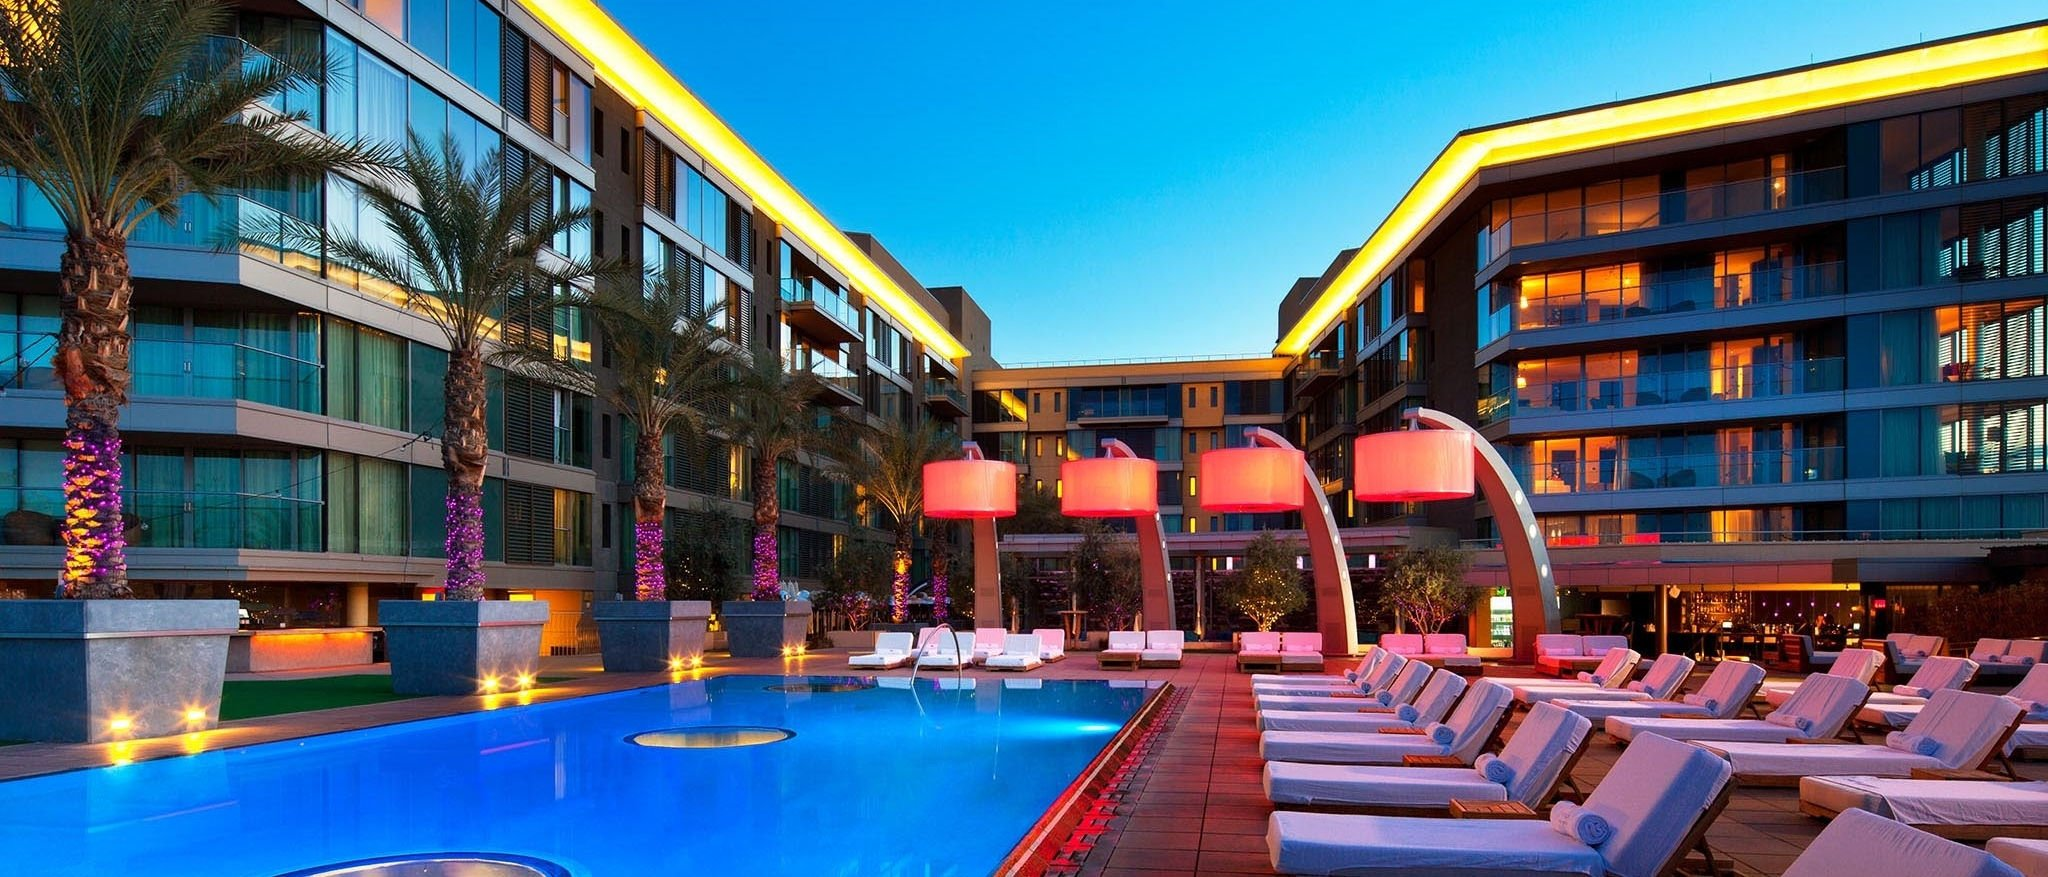 top hotel pools in the phoenix area - 3tv   cbs 5